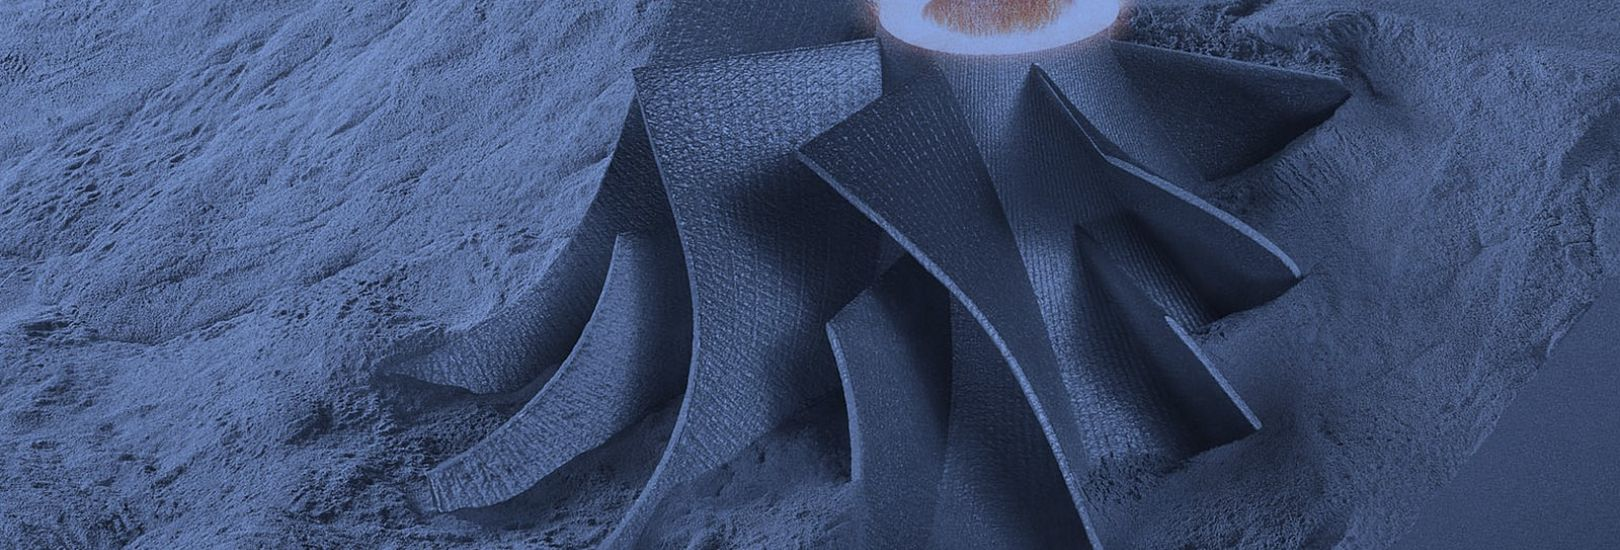 3D Printing Australia